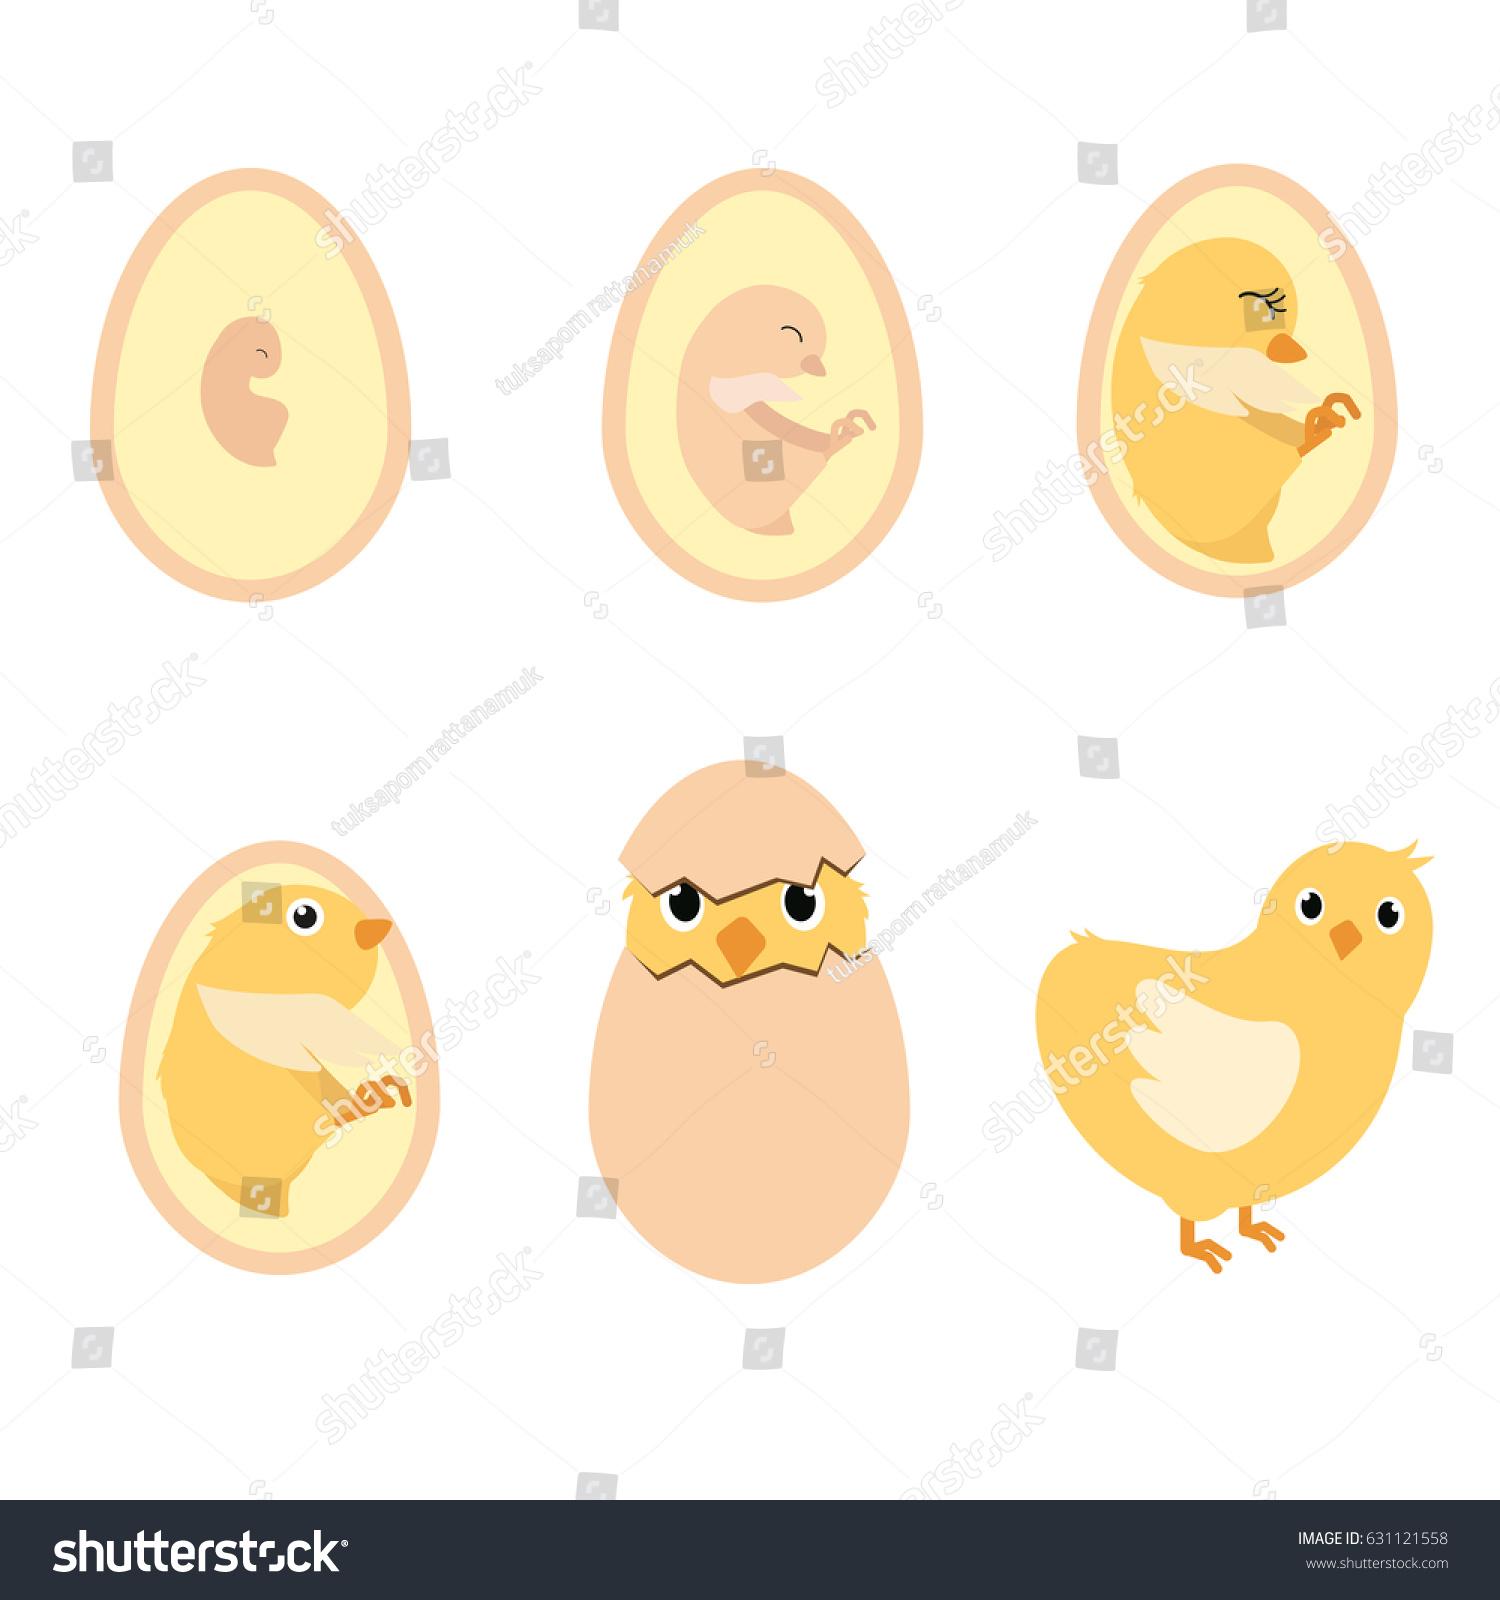 Chicken Egg Life Cycle Anatomy Illustration Stock Vector 631121558 ...